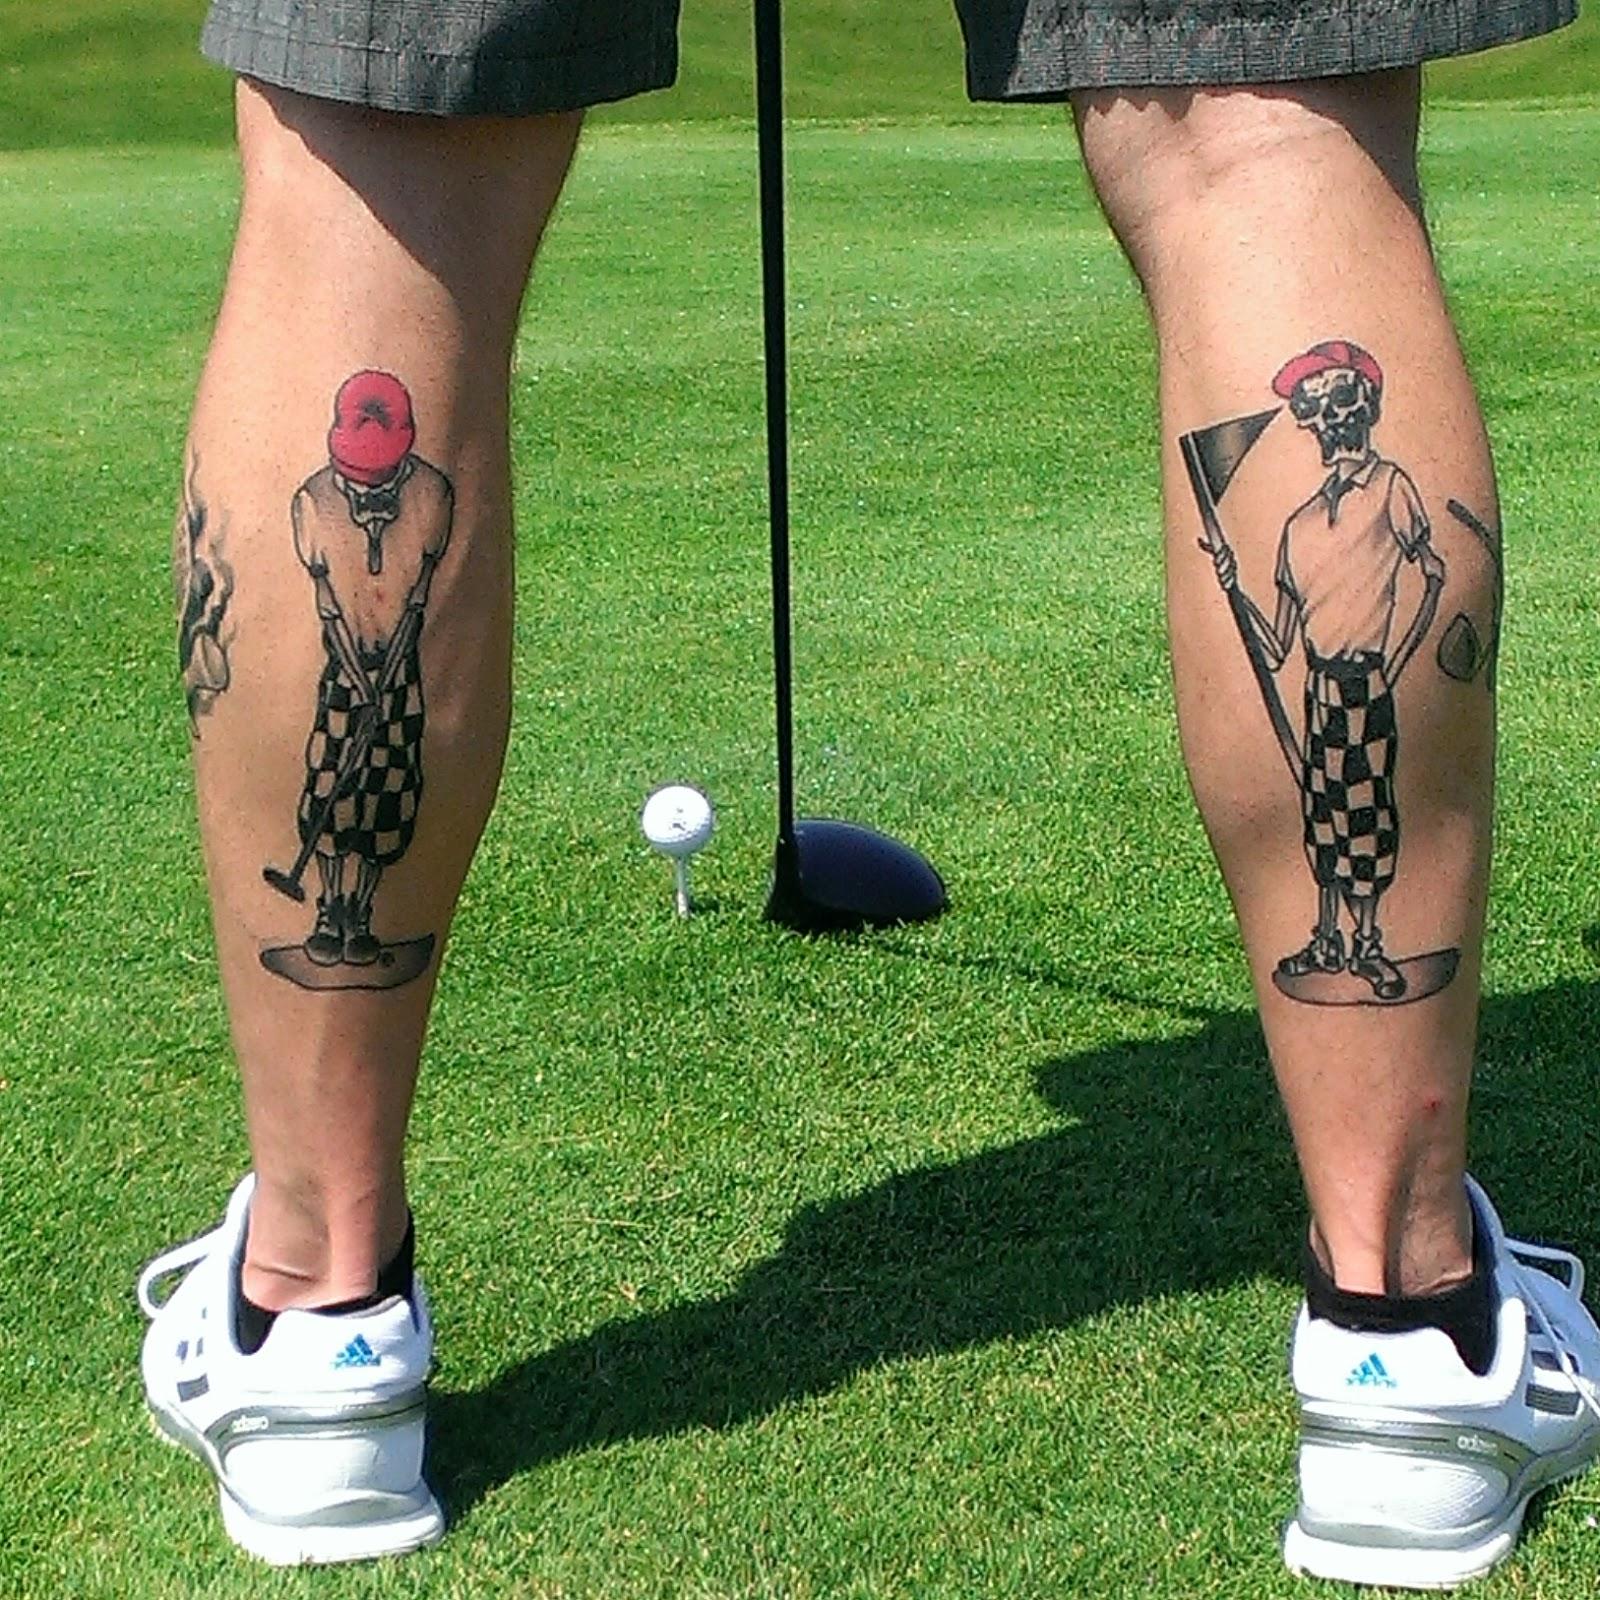 Tattoo Ideas Golf: Send Your Golf Tattoos